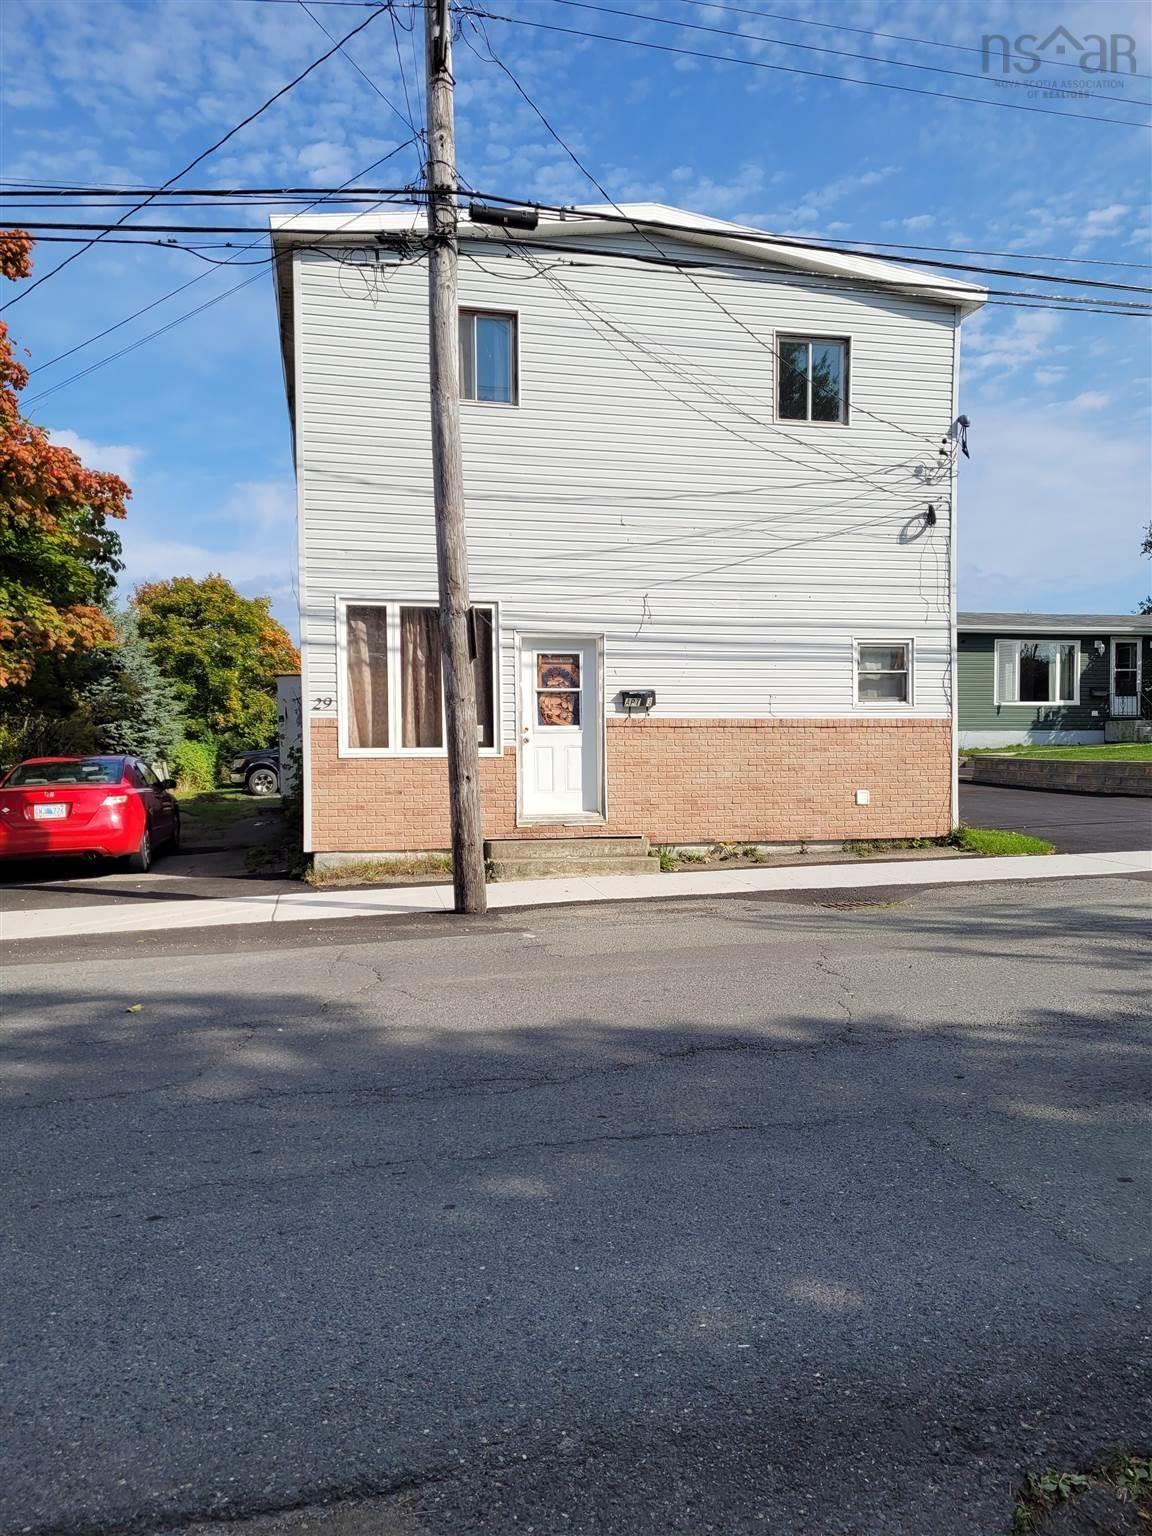 Main Photo: 29 Pitt Street in Glace Bay: 203-Glace Bay Multi-Family for sale (Cape Breton)  : MLS®# 202125714